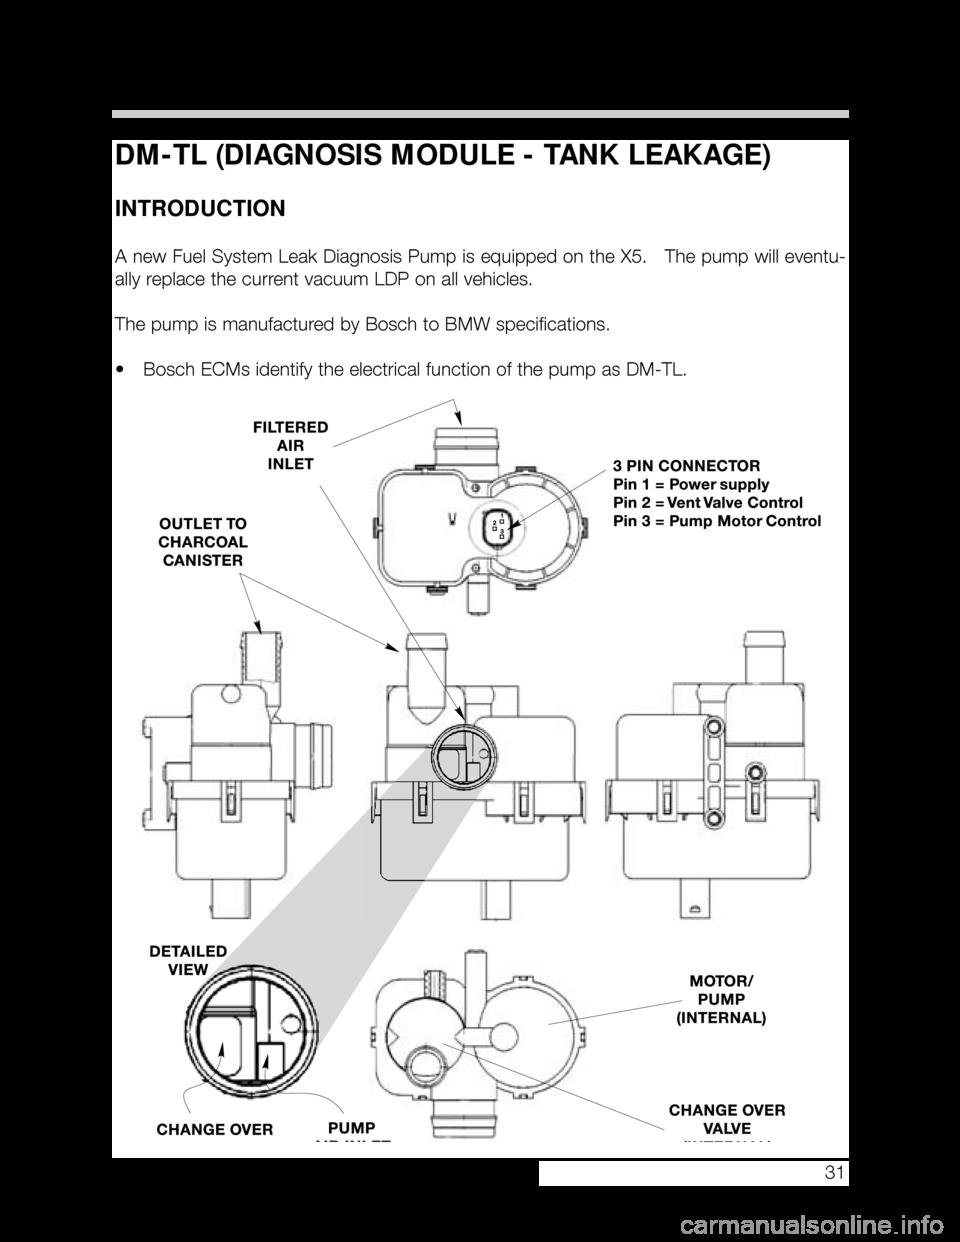 Repair Manual Bosch Pump 3 1l Engine Fuel Flow Diagram Array Bmw X5 2002 E53 M62tu Workshop Rh Carmanualsonline Info Diesel